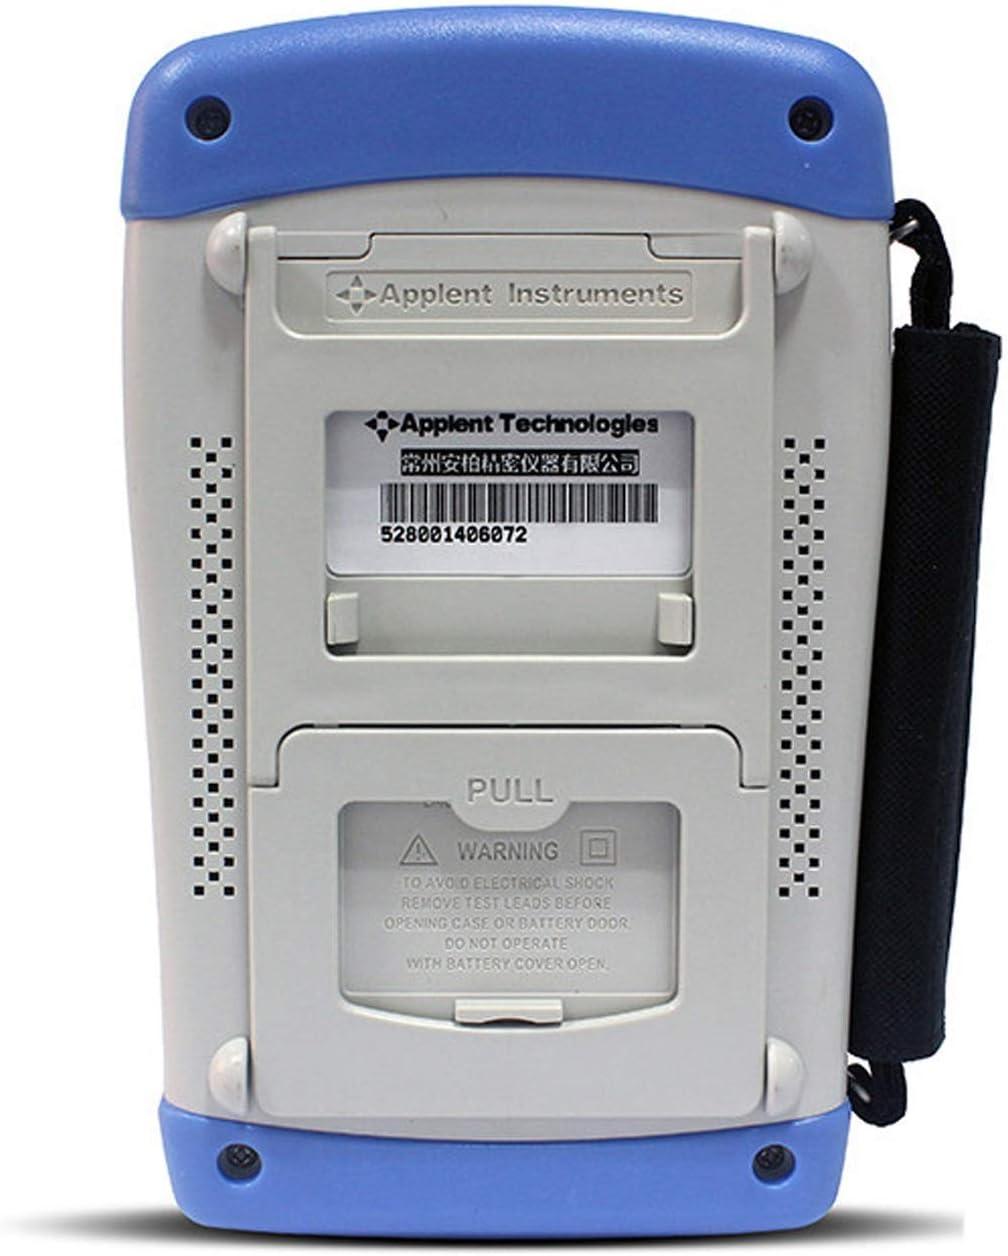 SDY-SDY Precise instrument Handheld Battery Tester Portable Digital AC Resistance Meter DC Voltage Battery Tester 100-240V50//60Hz 0.35A Resistance